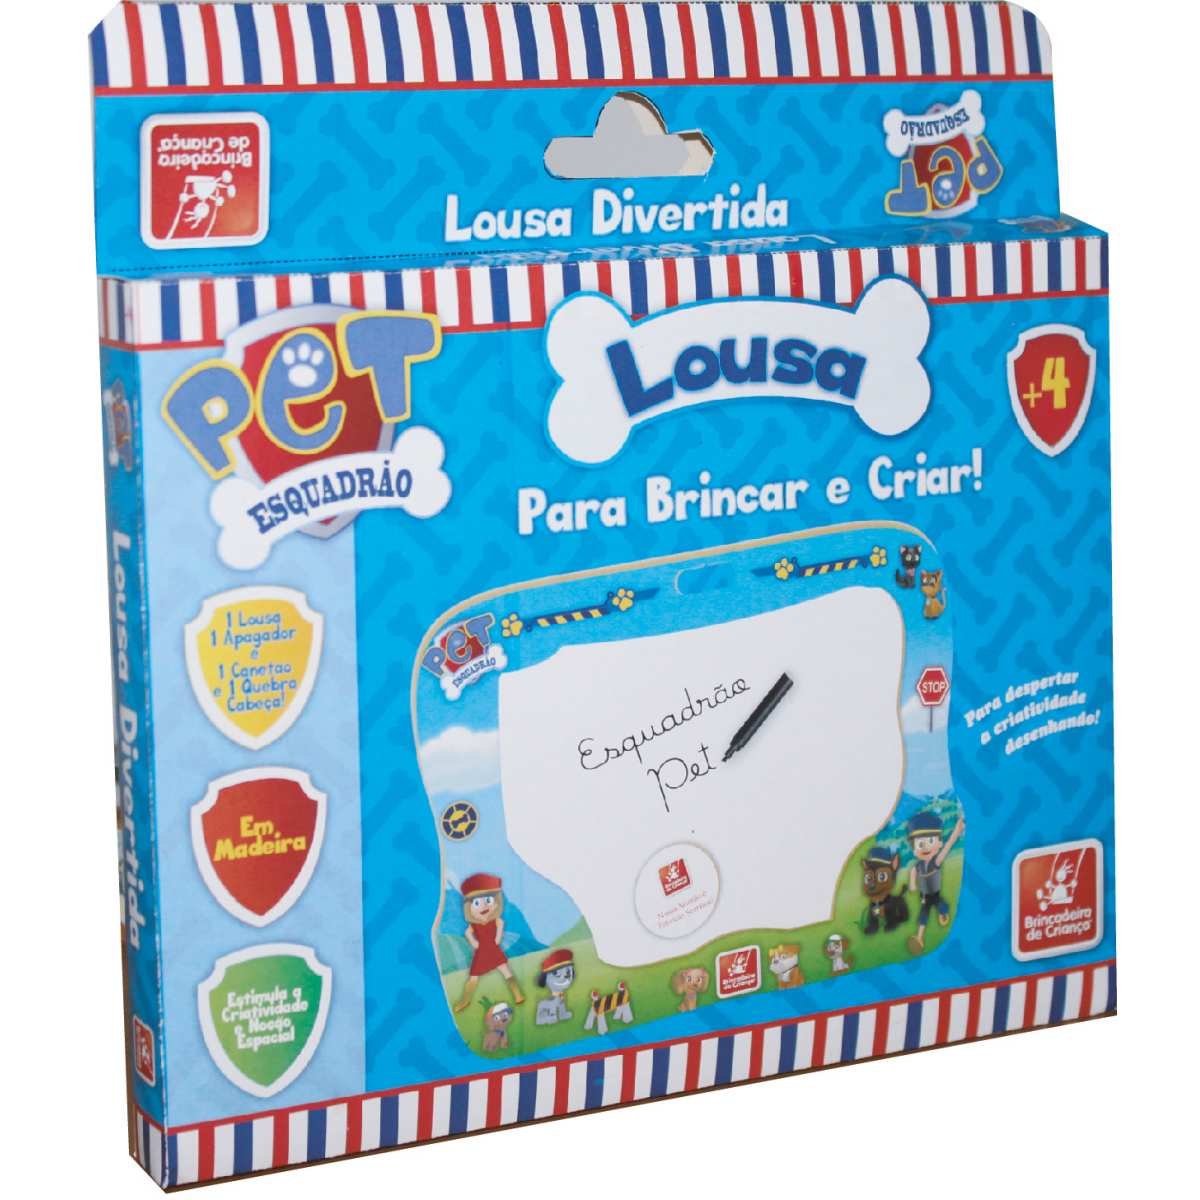 Lousa Infantil | Esquadro Pet C/Q.Cabeca | Brinc. de Crianca